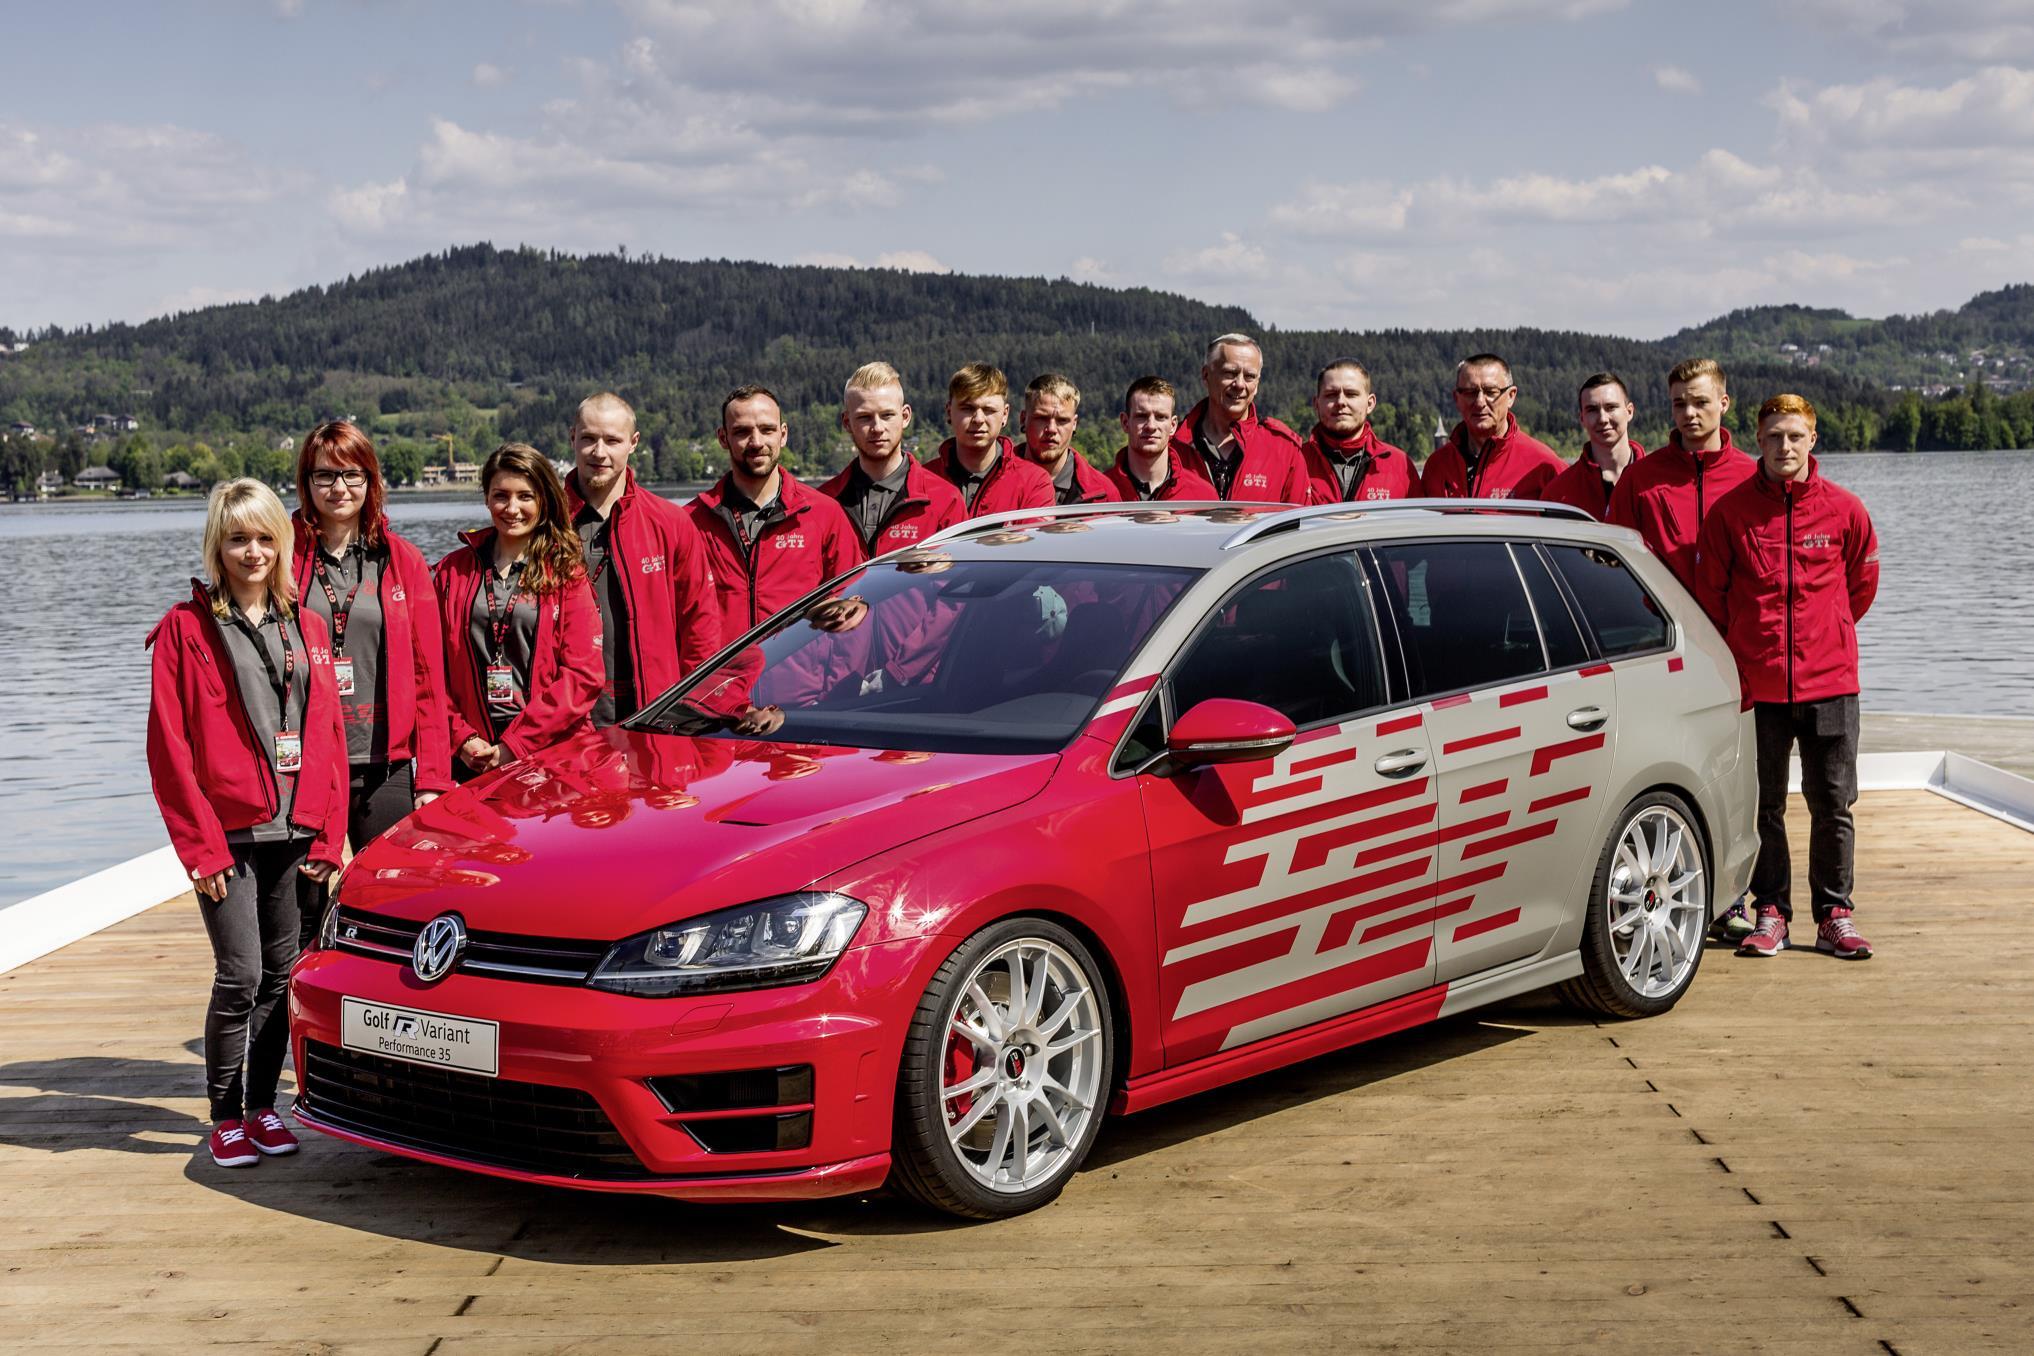 Volkswagen Apprentices Develop 400 HP Golf for 2016 Worthersee